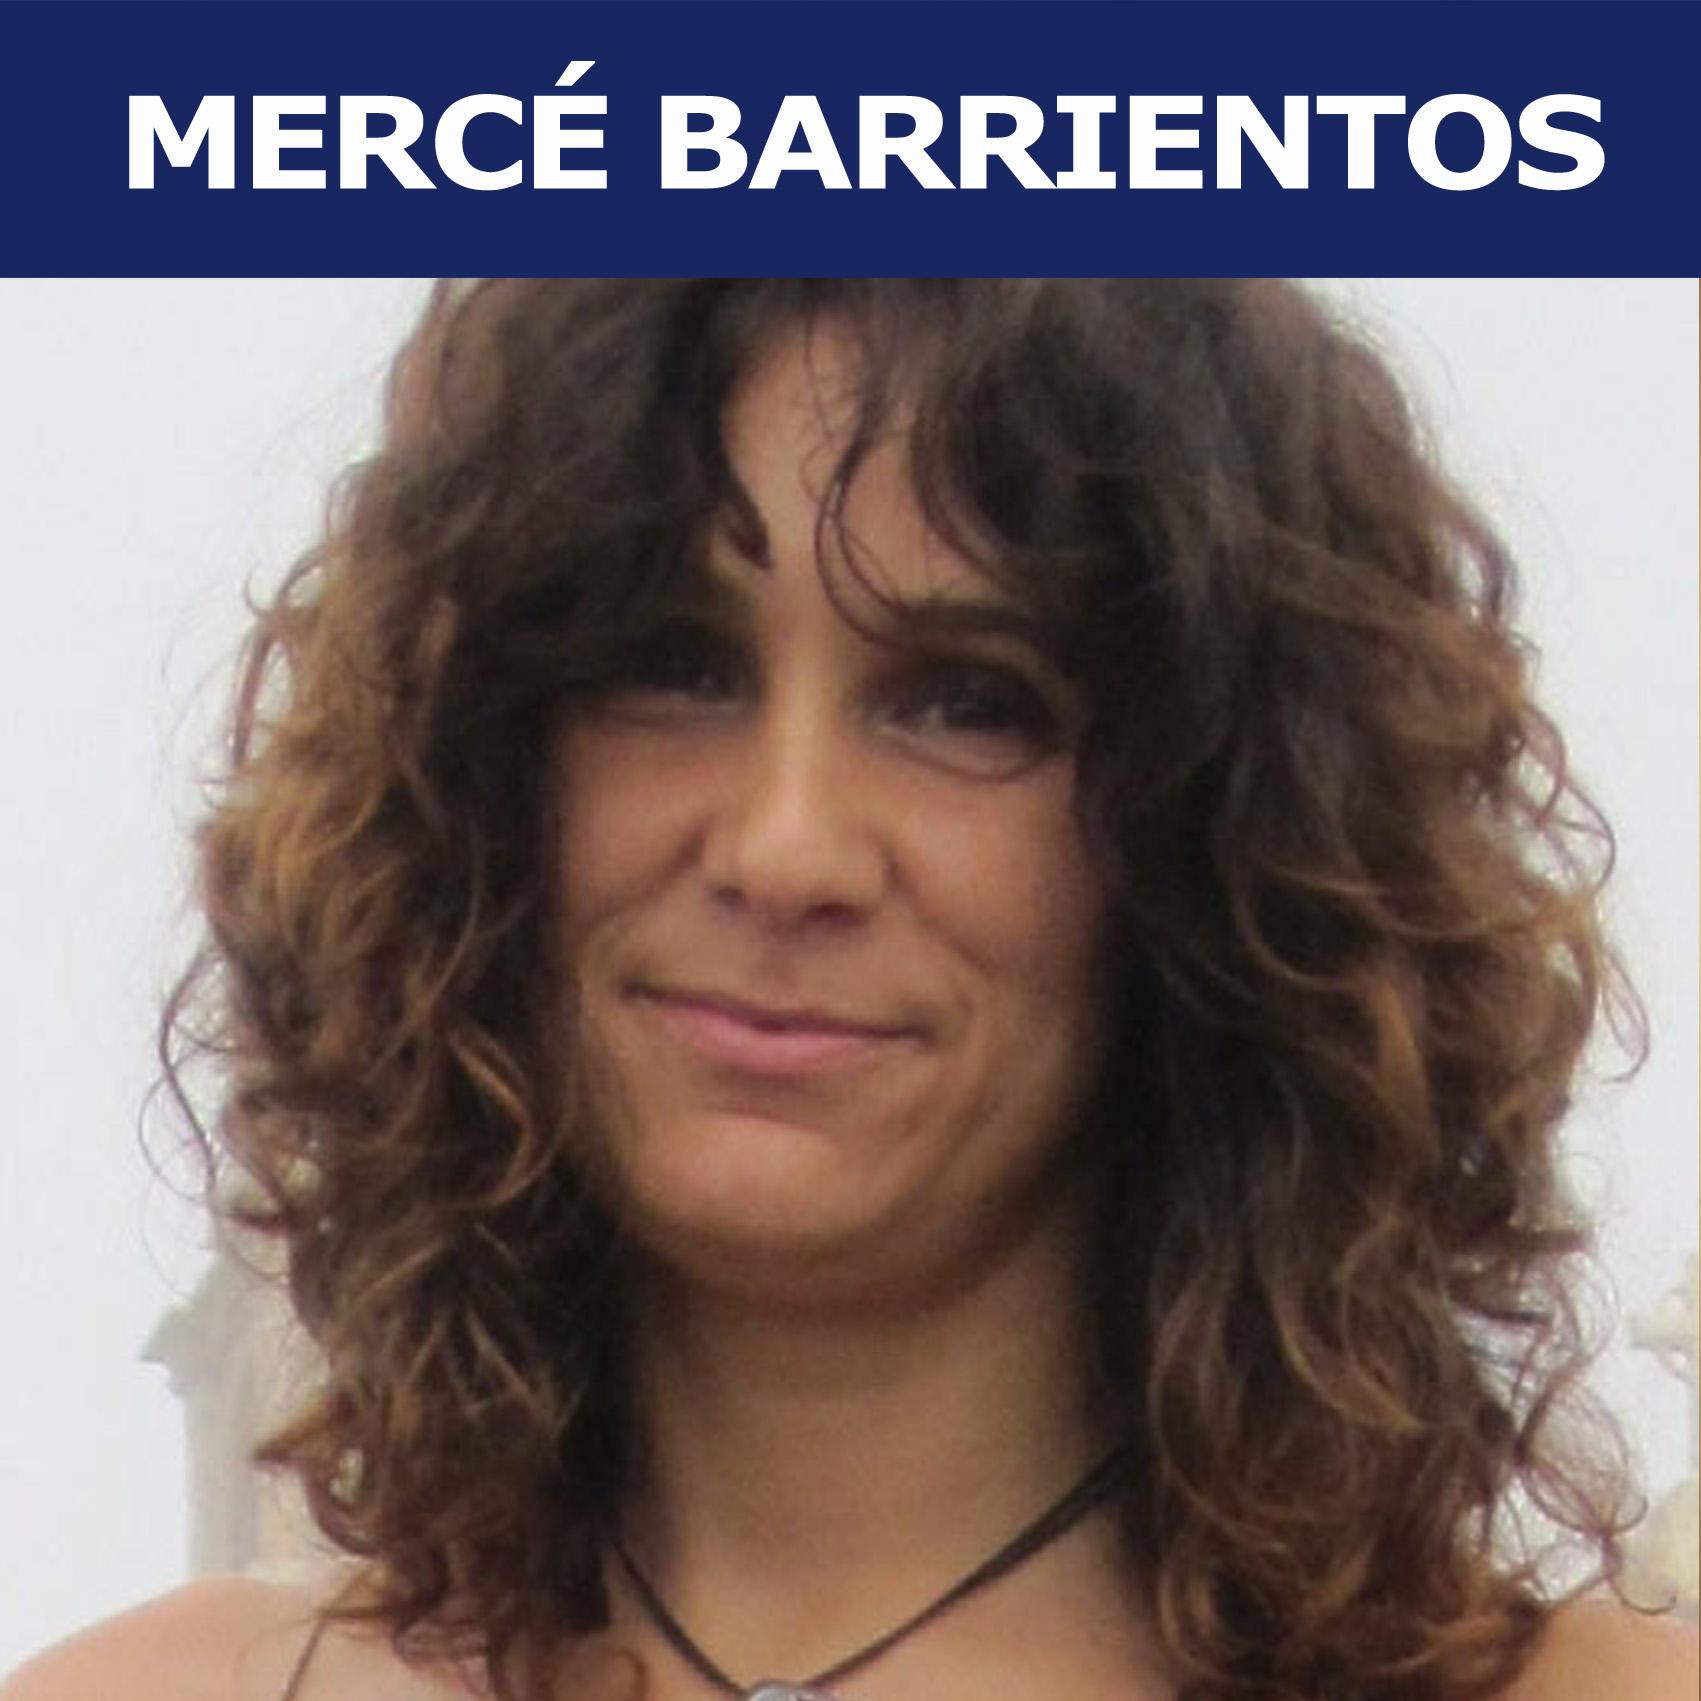 Mercé Barrientos